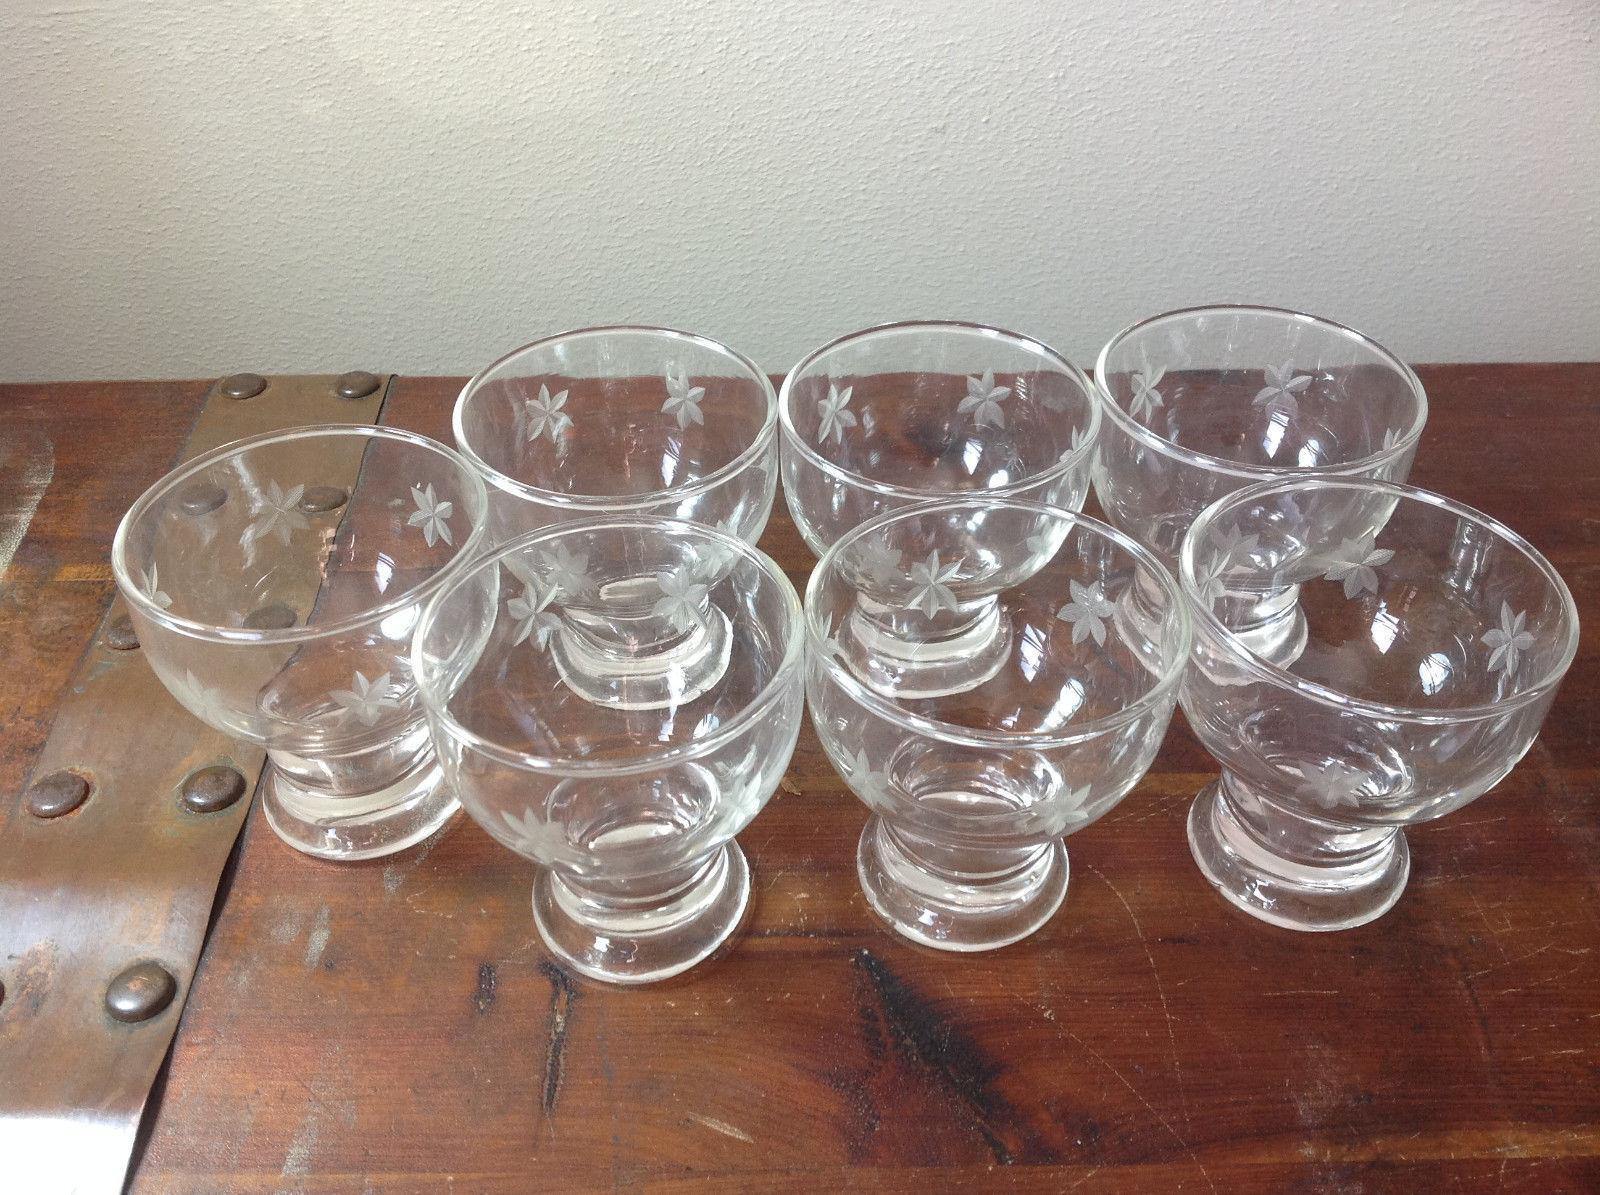 Seven Piece Set of Crystal Dessert Dishes Copper Wheel Engraving Handmade